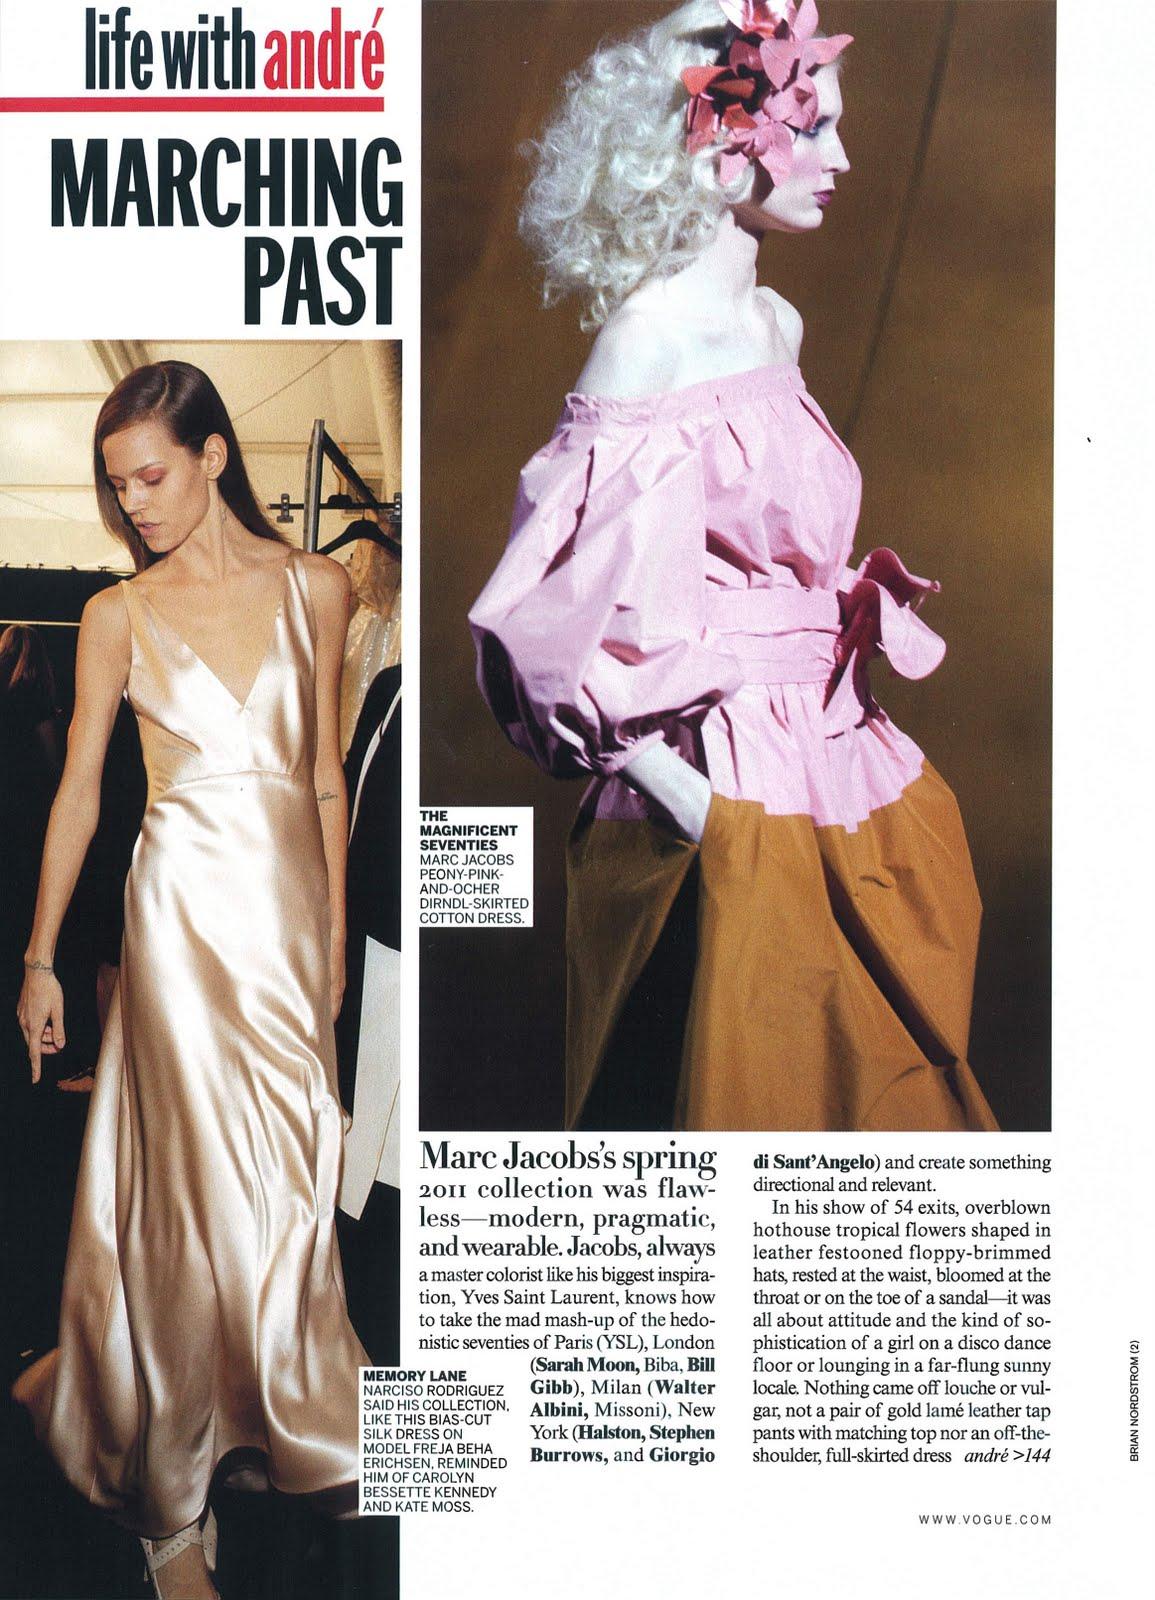 http://2.bp.blogspot.com/_Y6tlSy01D1s/TMrJfp-jabI/AAAAAAAAGWo/LJ9jfnZFBbg/s1600/Magazine+Clipping+-+Vogue+US+Nov10+My+Scan.jpg